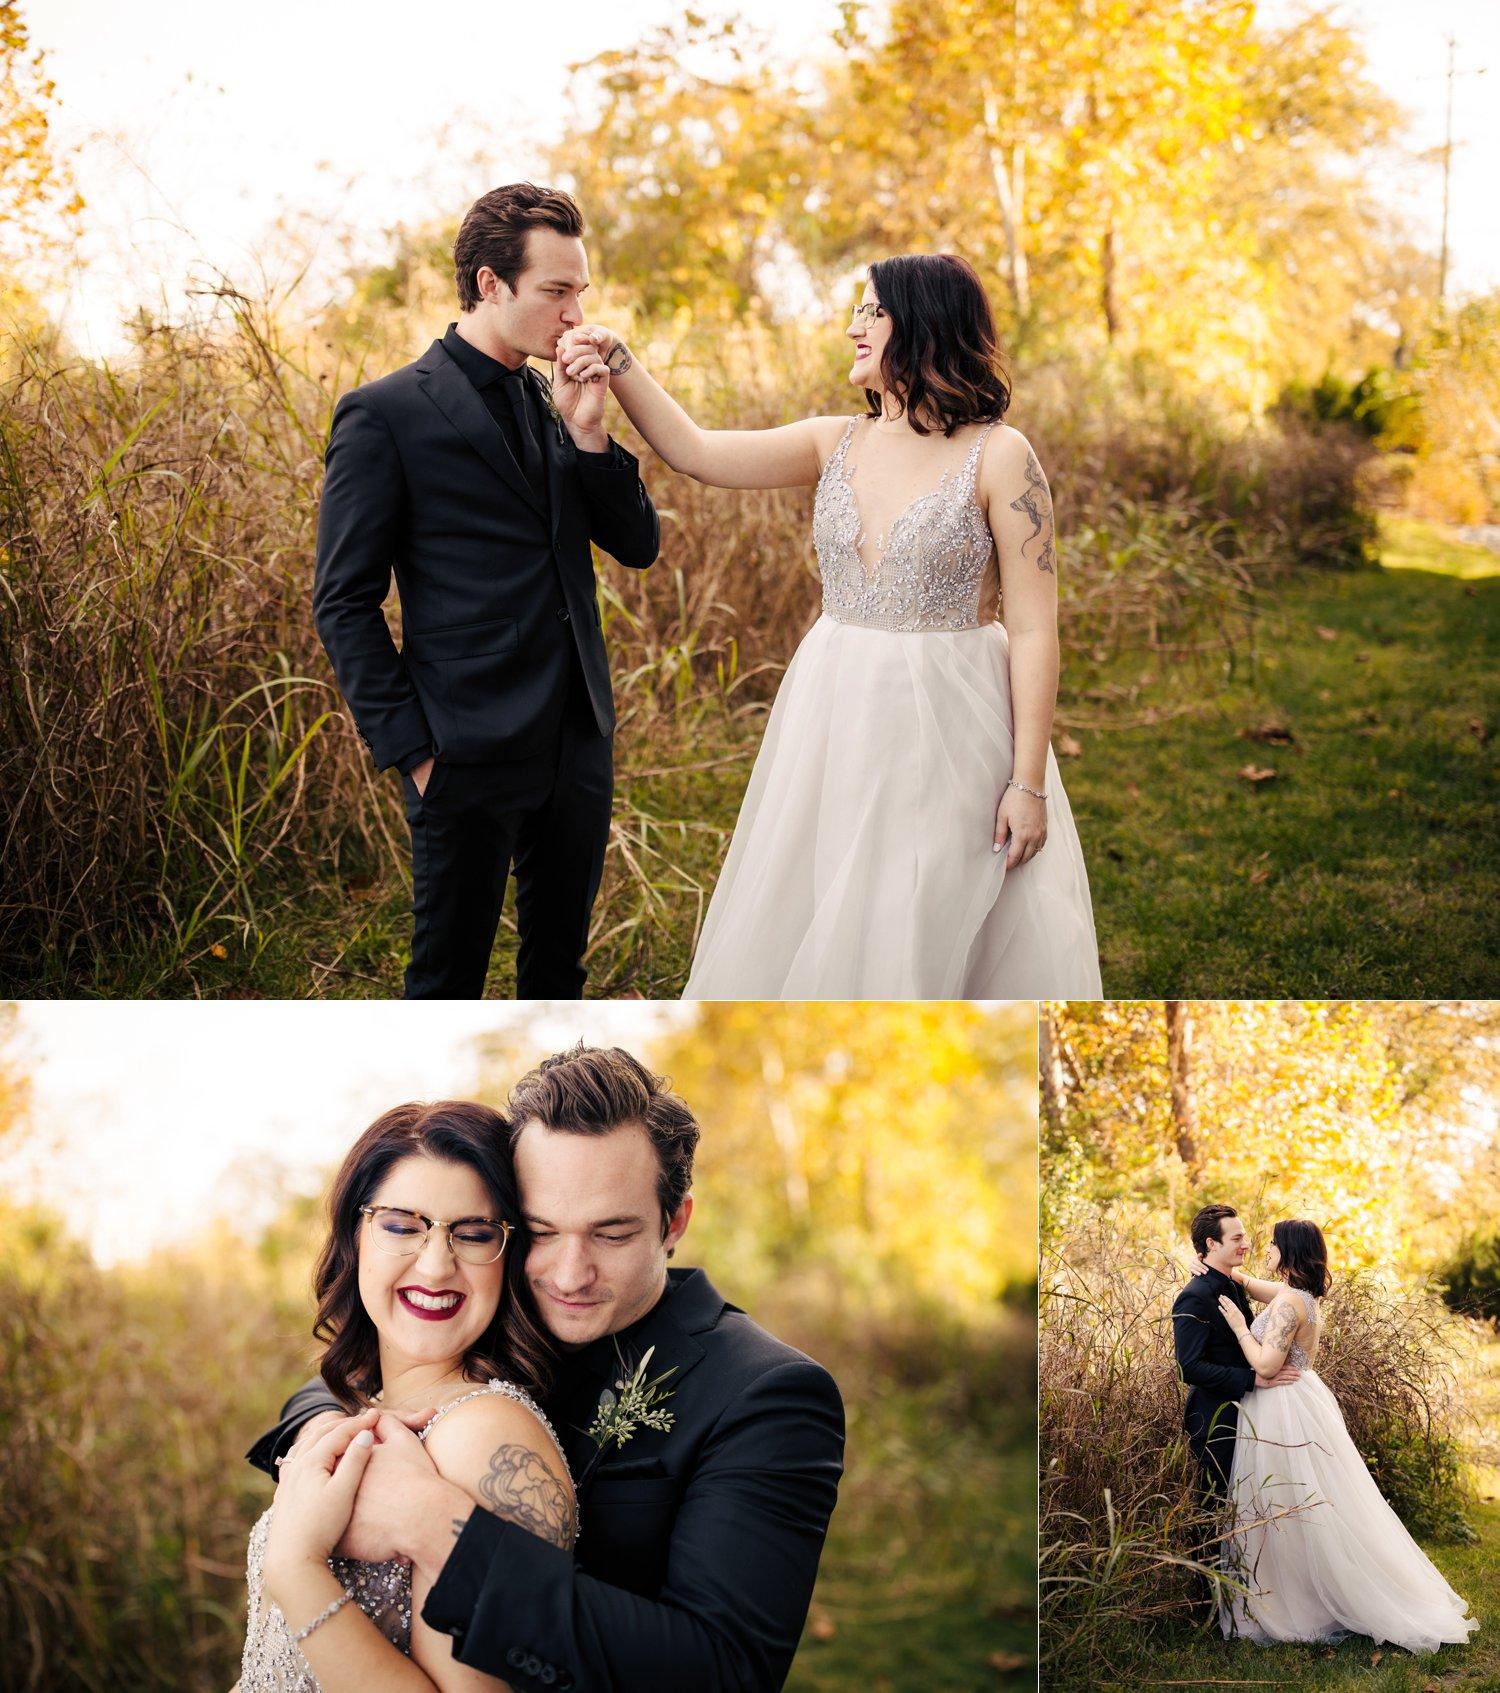 CK-Photo-Nashville-engagement-wedding-photographer-fat-bottom-brewery